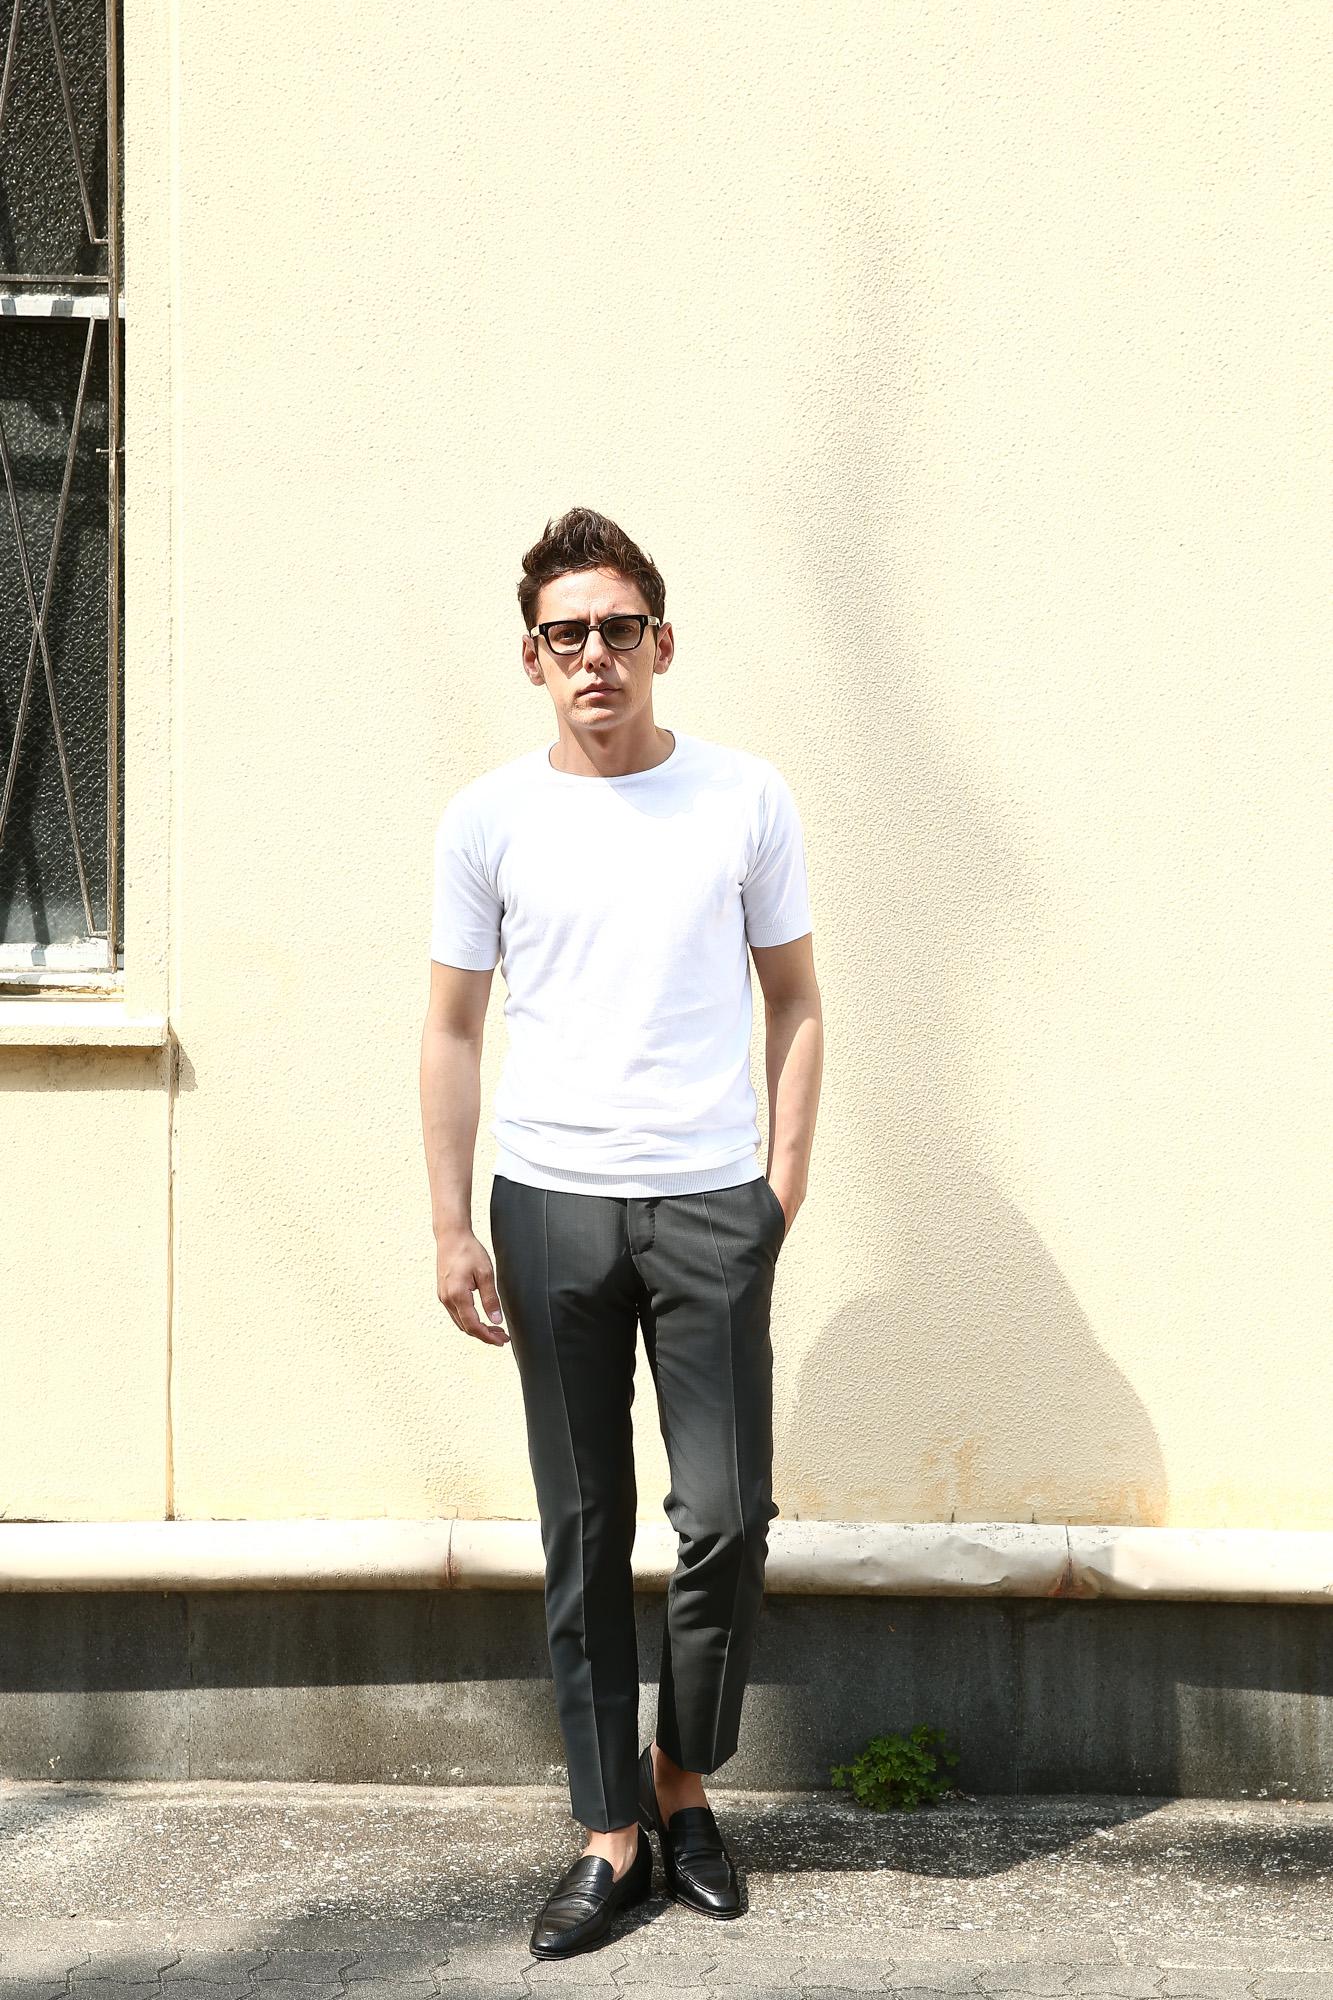 JOHN SMEDLEY (ジョンスメドレー) BELDEN (ベルデン) SEA ISLAND COTTON (シーアイランドコットン) ショートスリーブ コットンニット Tシャツ WHITE (ホワイト) Made in England (イギリス製) 2018 春夏新作 johnsmedley スメドレー 愛知 名古屋 ZODIAC ゾディアック ニットTEE